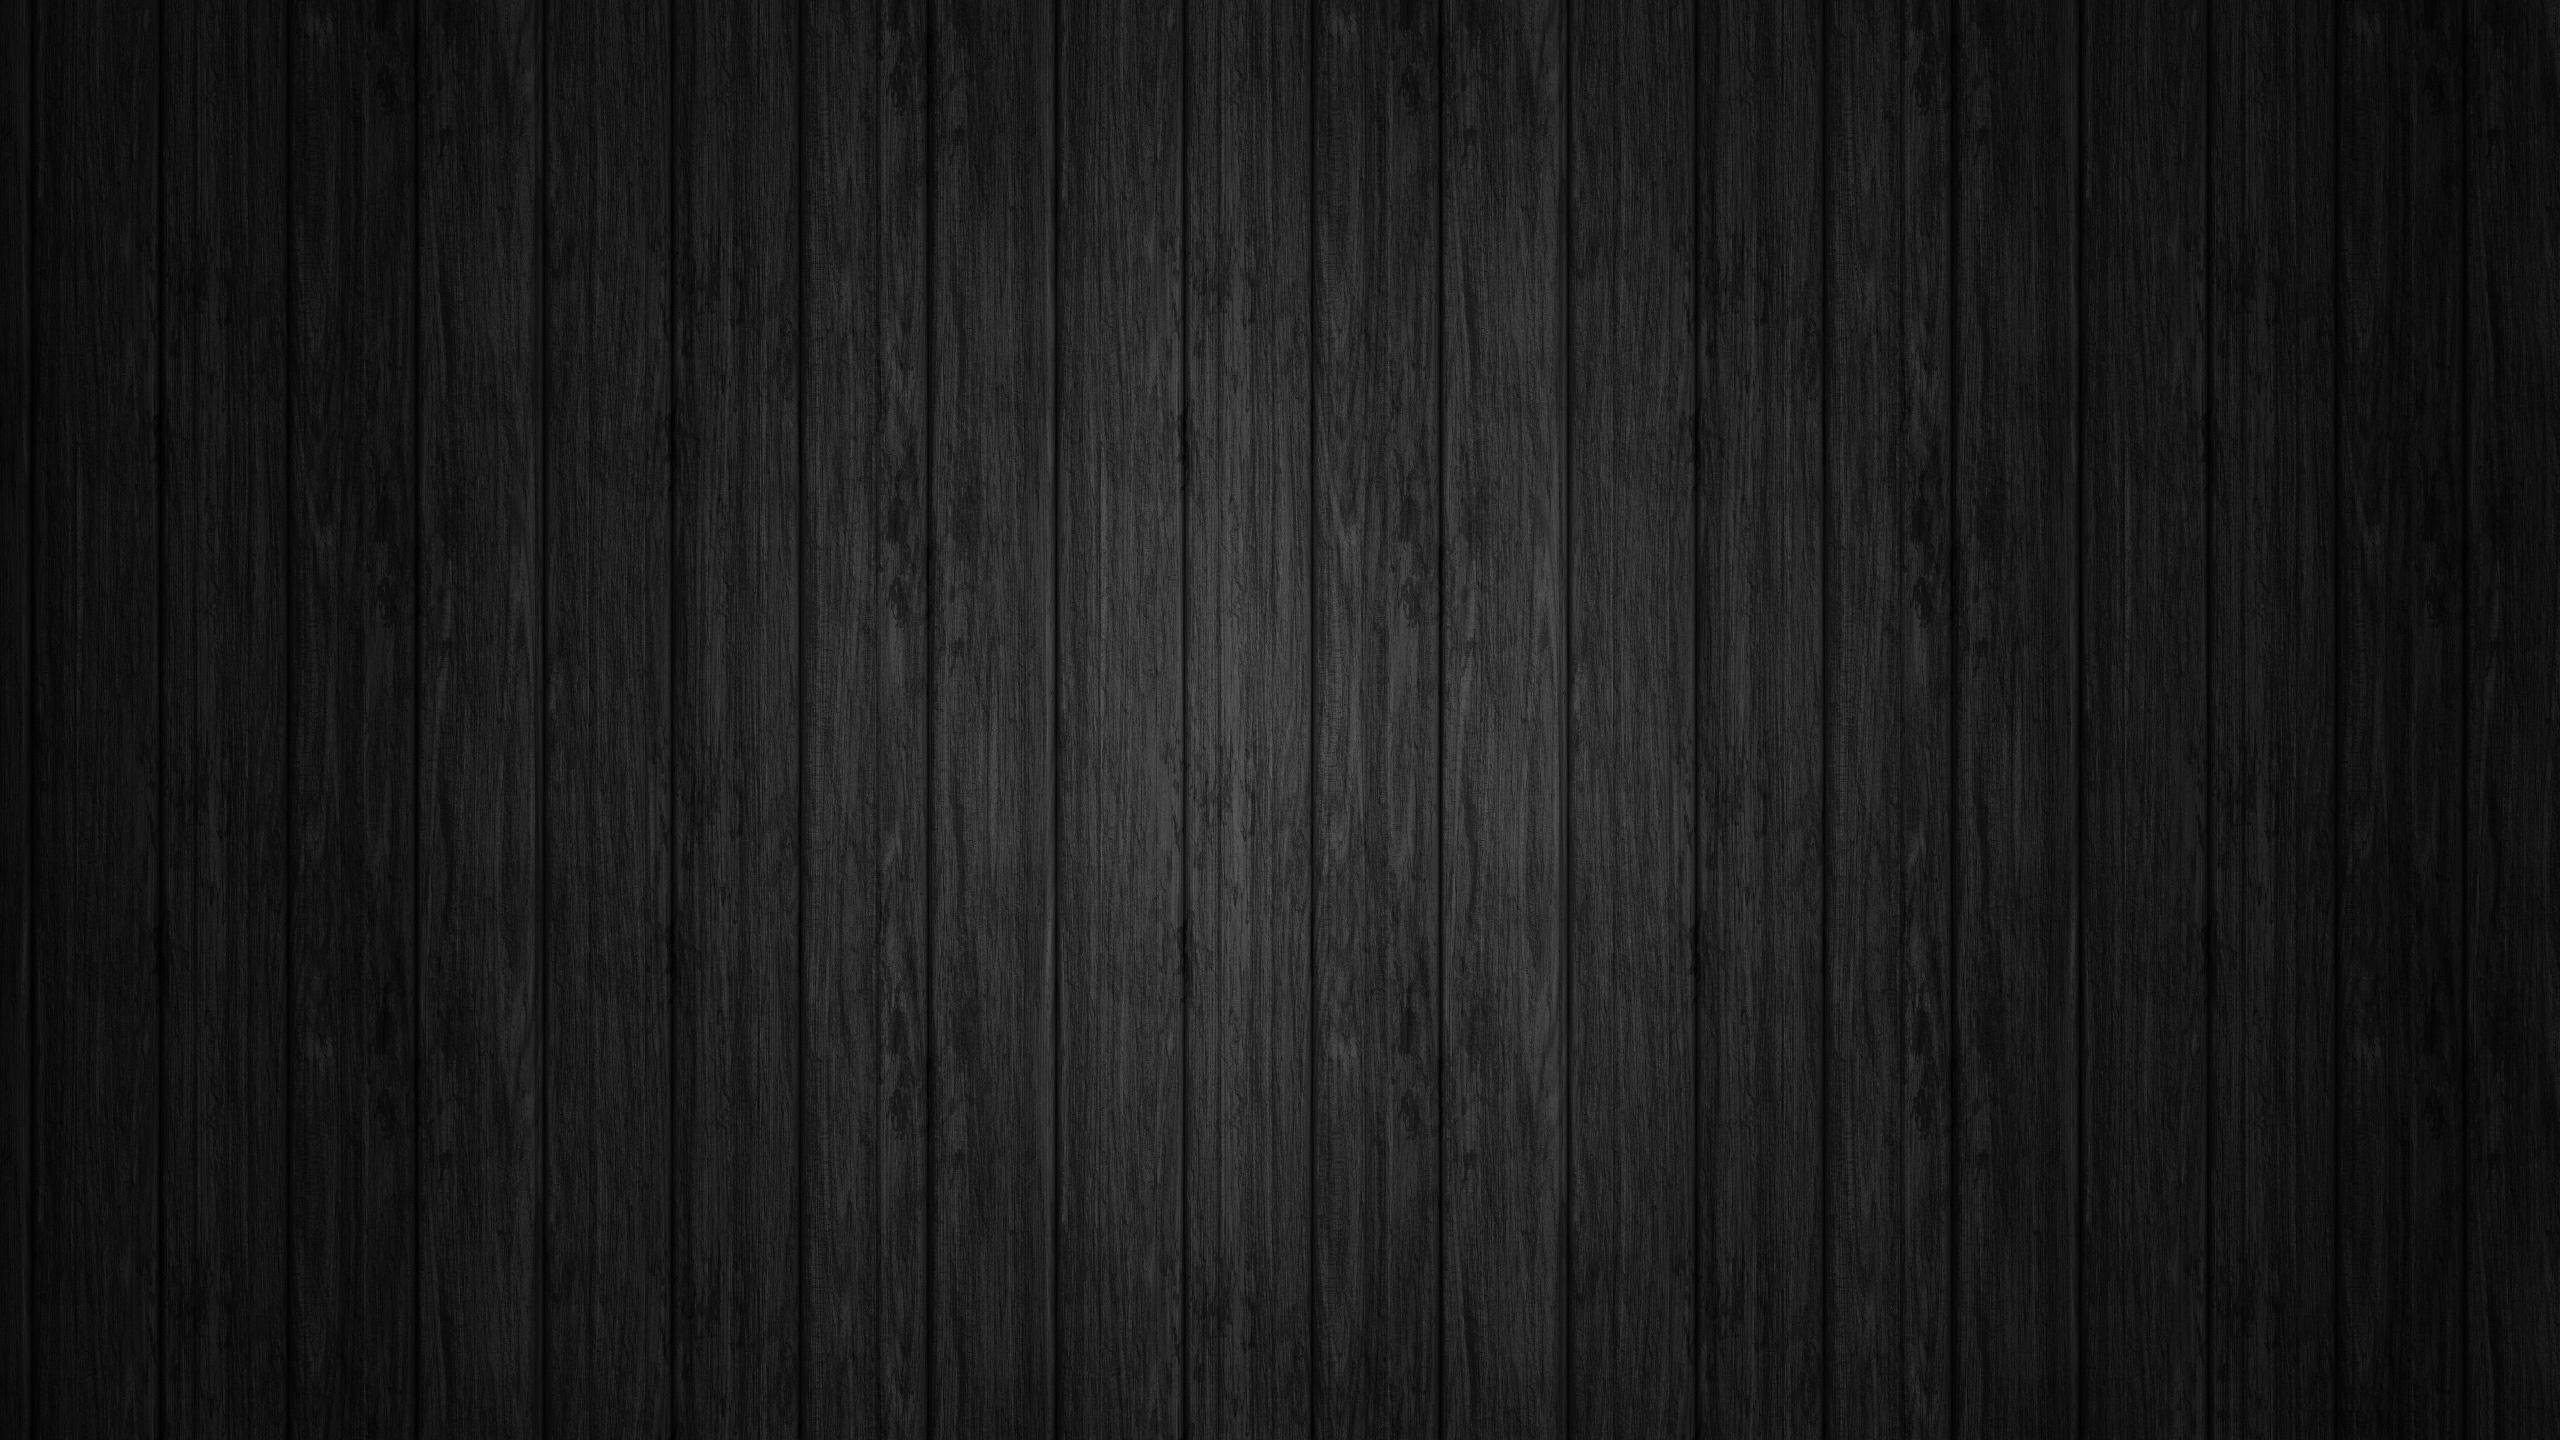 Top Wallpaper Home Screen Wood - tumblr_static_tumblr_static_tumblr_static_tumblr_static_black_background_wood_2560x1440_by_starlyz-d4n0342  Image_274025.jpg